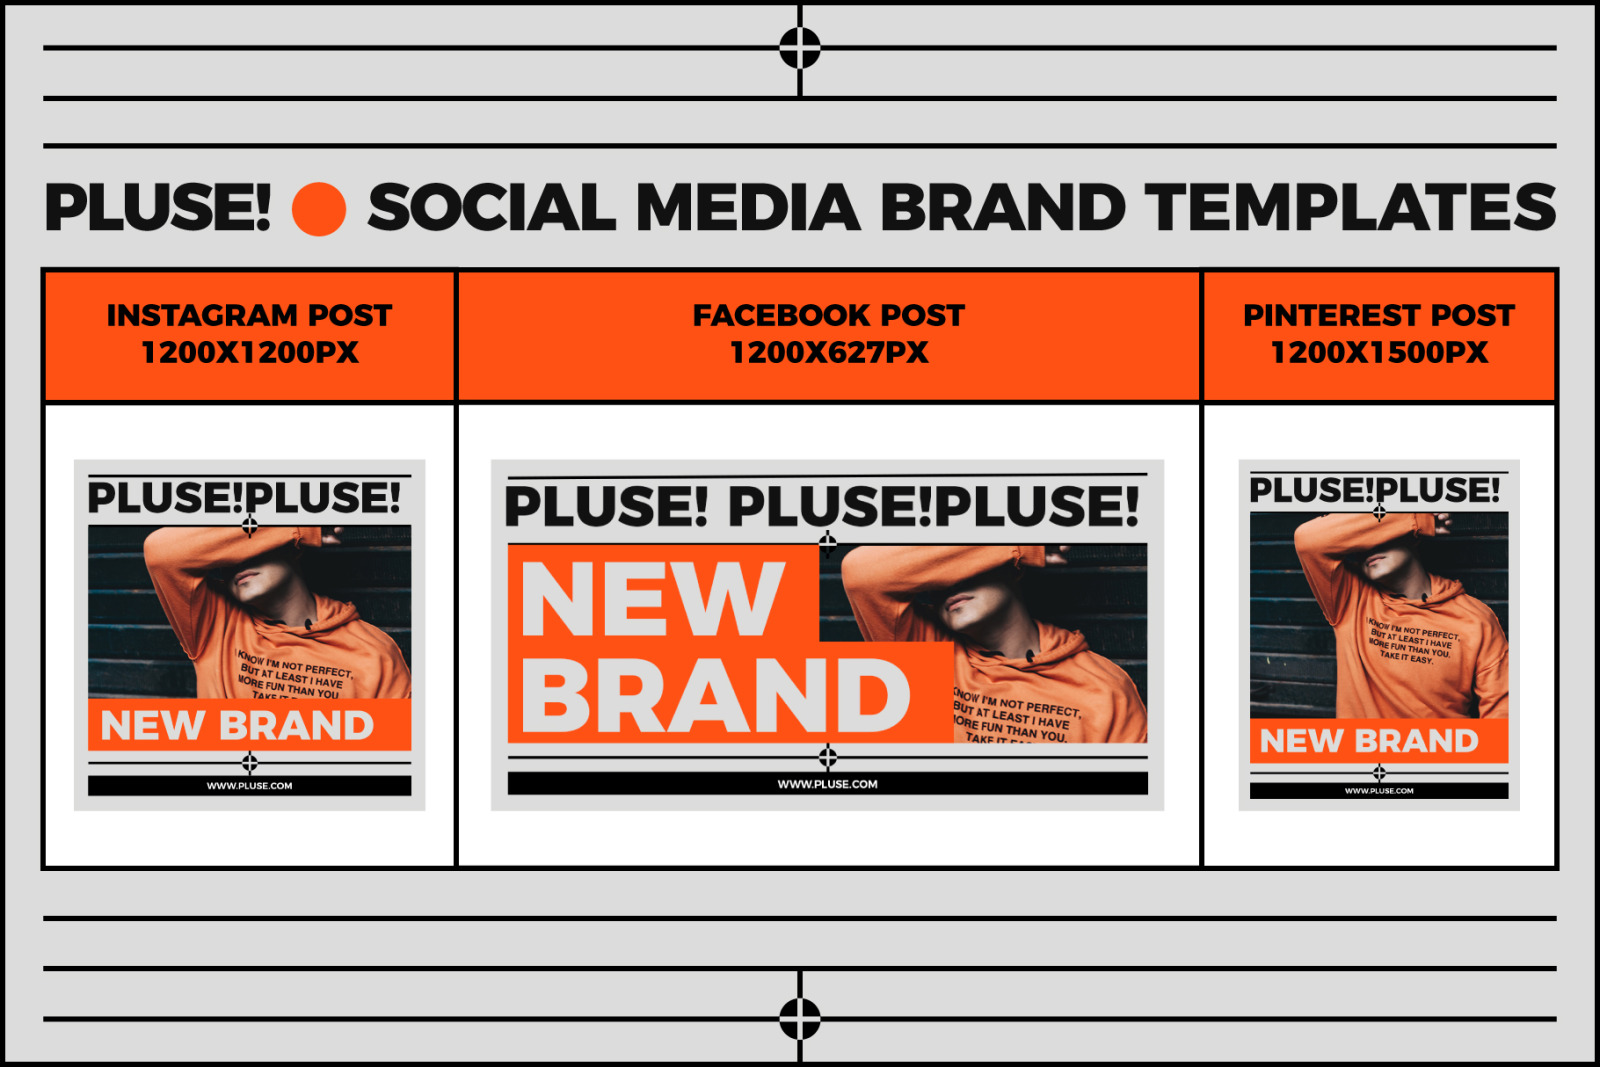 PLUSE!-SOCIAL MEDIA BRAND TEMPLATES